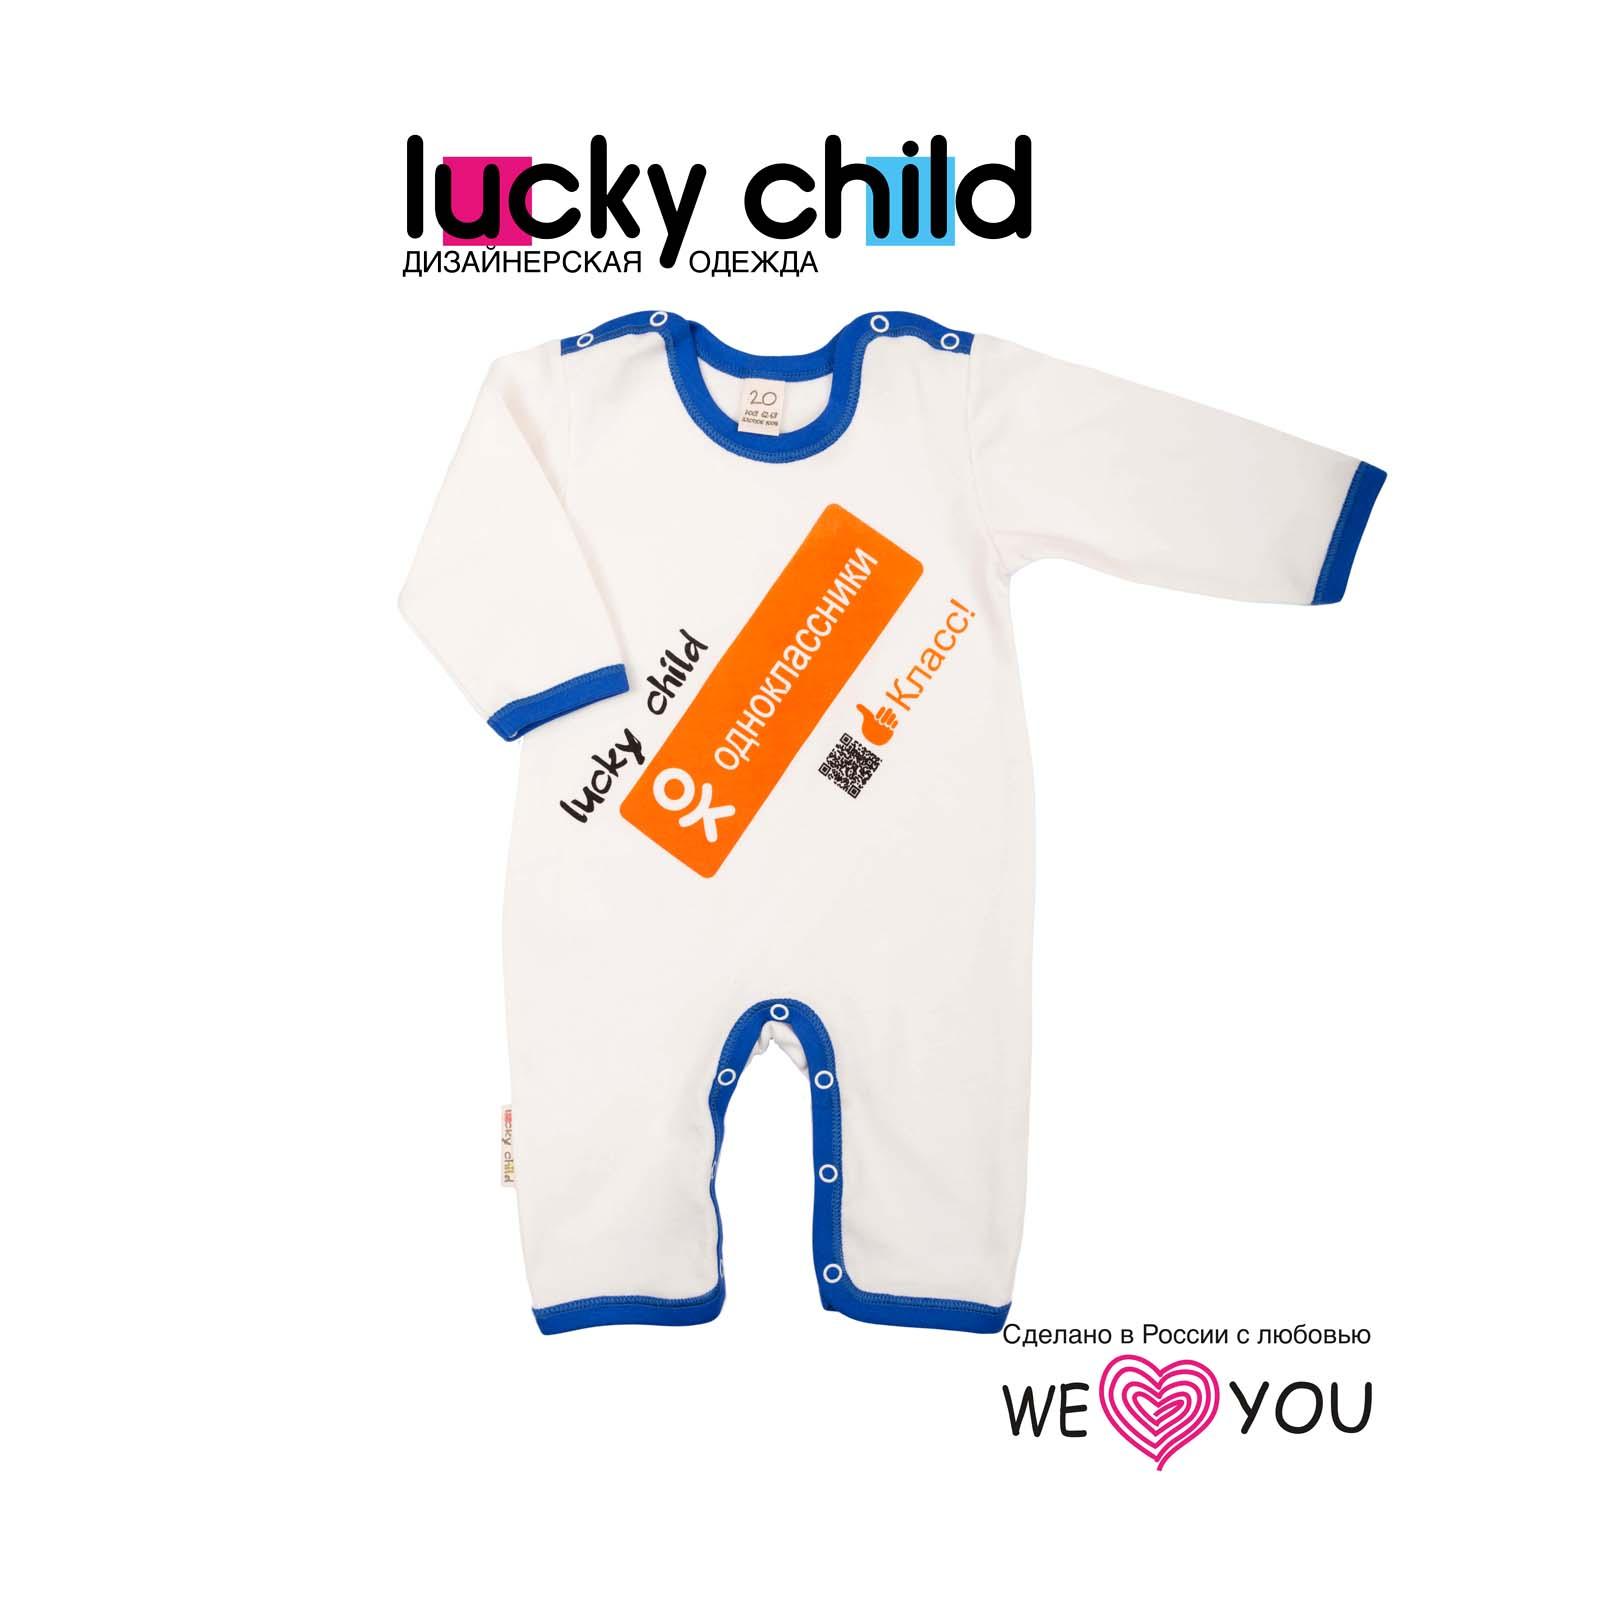 Комбинезон Lucky Child с надписью Одноклассники размер 68<br>